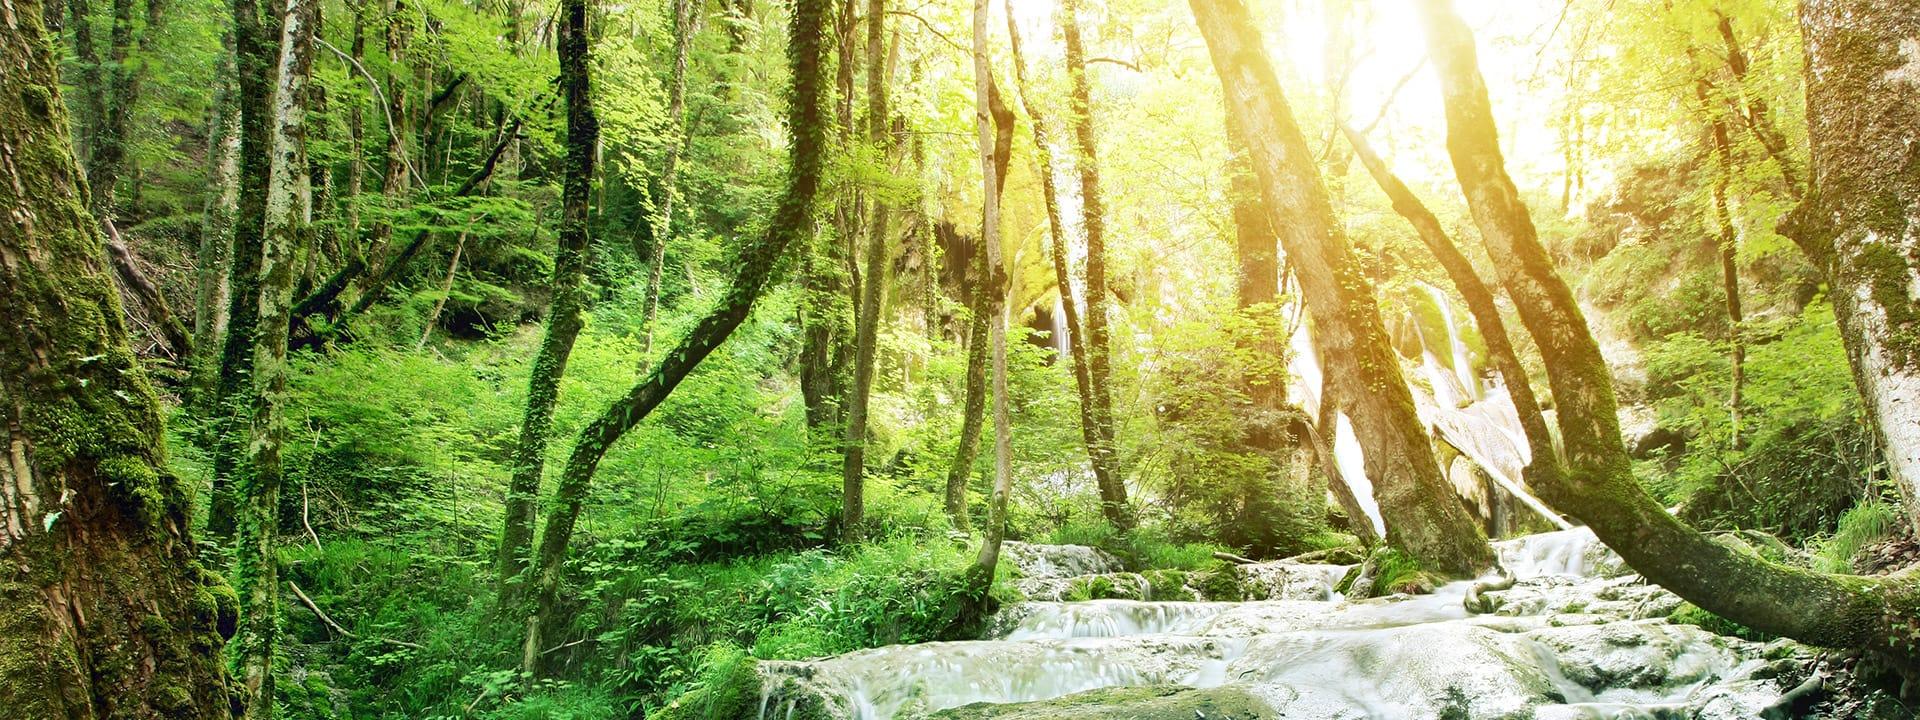 Contact Us | Serenity Gardens